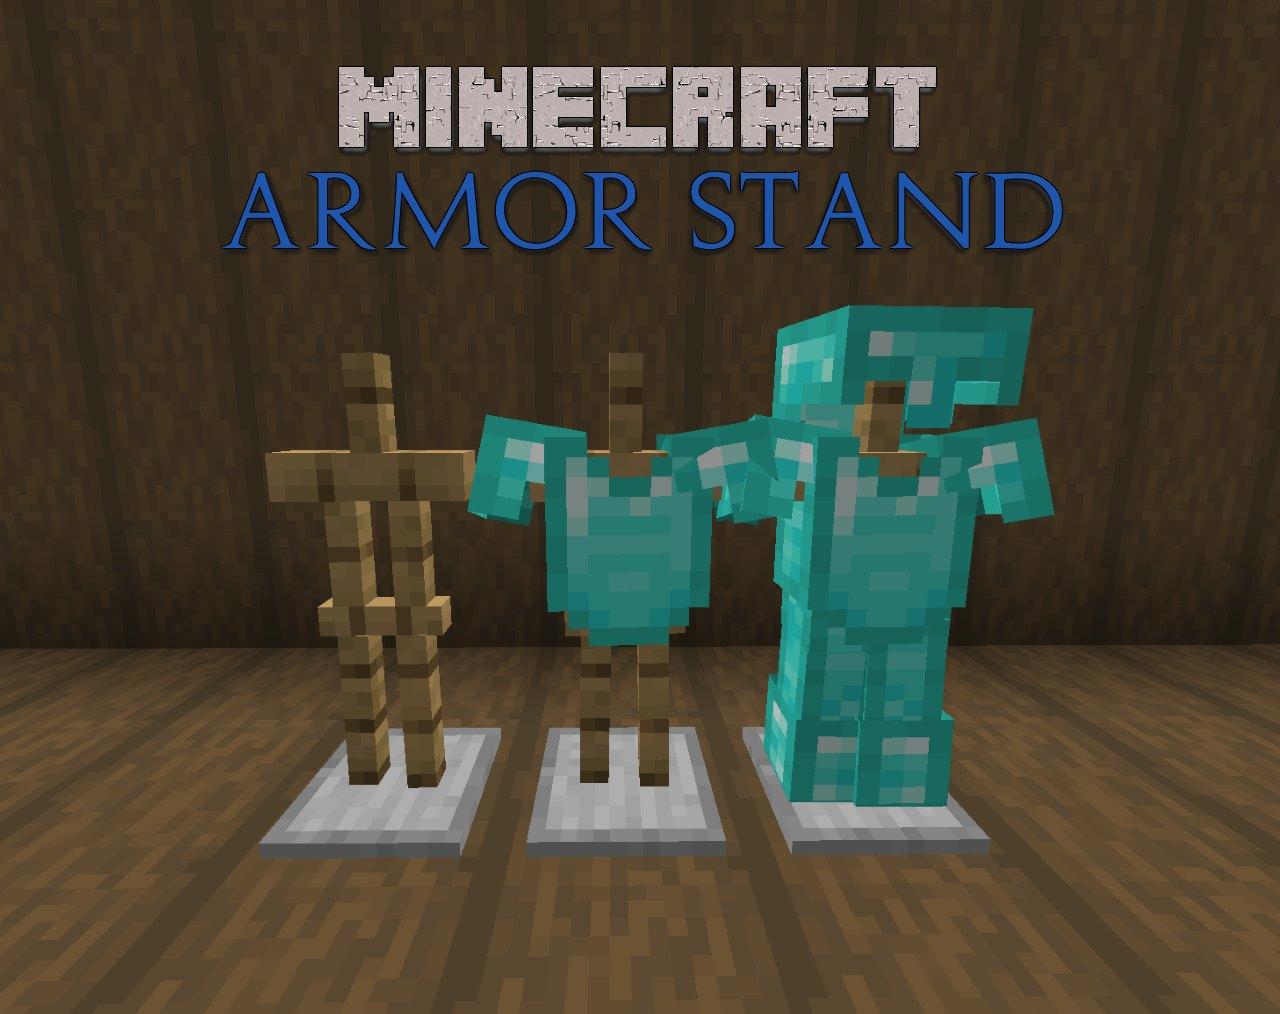 minecraft armor stands with diamond armor set